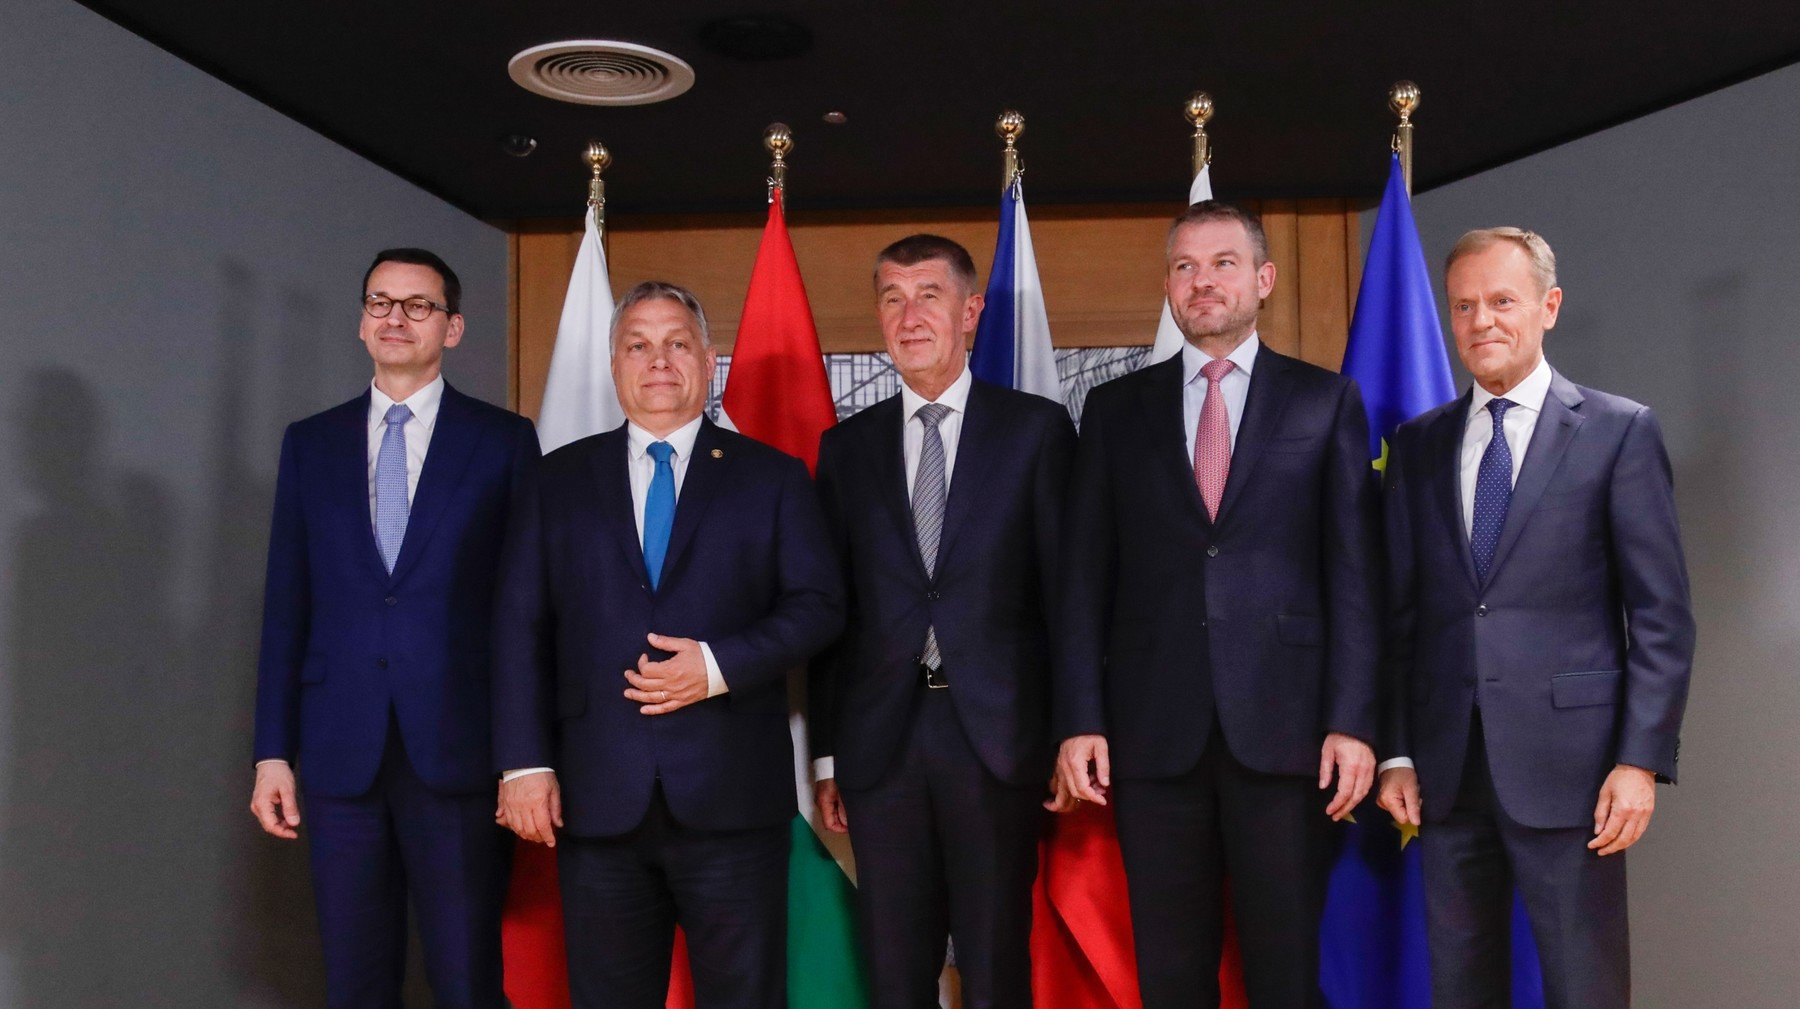 Zleva polský premiér Mateusz Morawiecki, maďarský premiér Viktor Orban, premiér ČR Andrej Babis, premiér SR Peter Pellegrini a prezident Evropské rady Donald Tusk před summitem Evropské unie v Bruselu